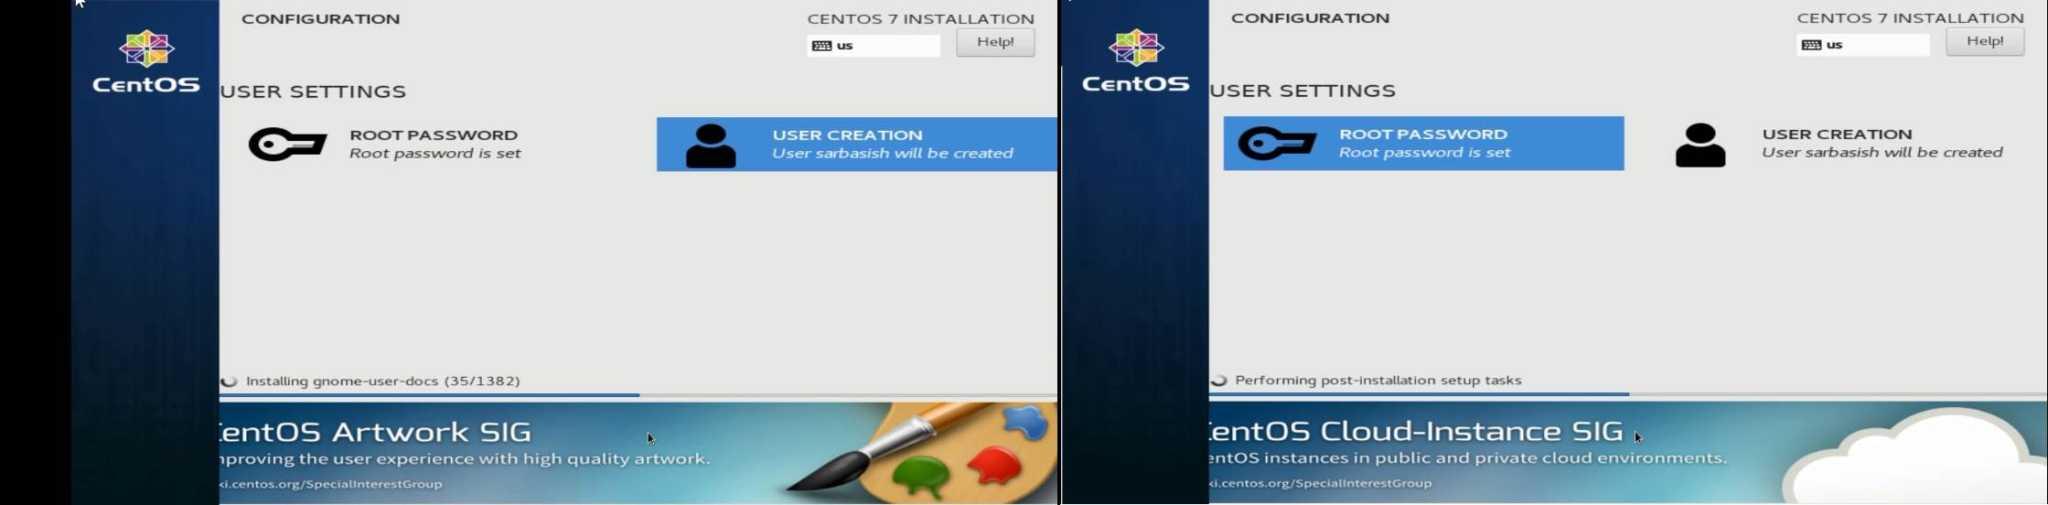 How to install CentOS 7 on a PC via bootable USB | H2S Media